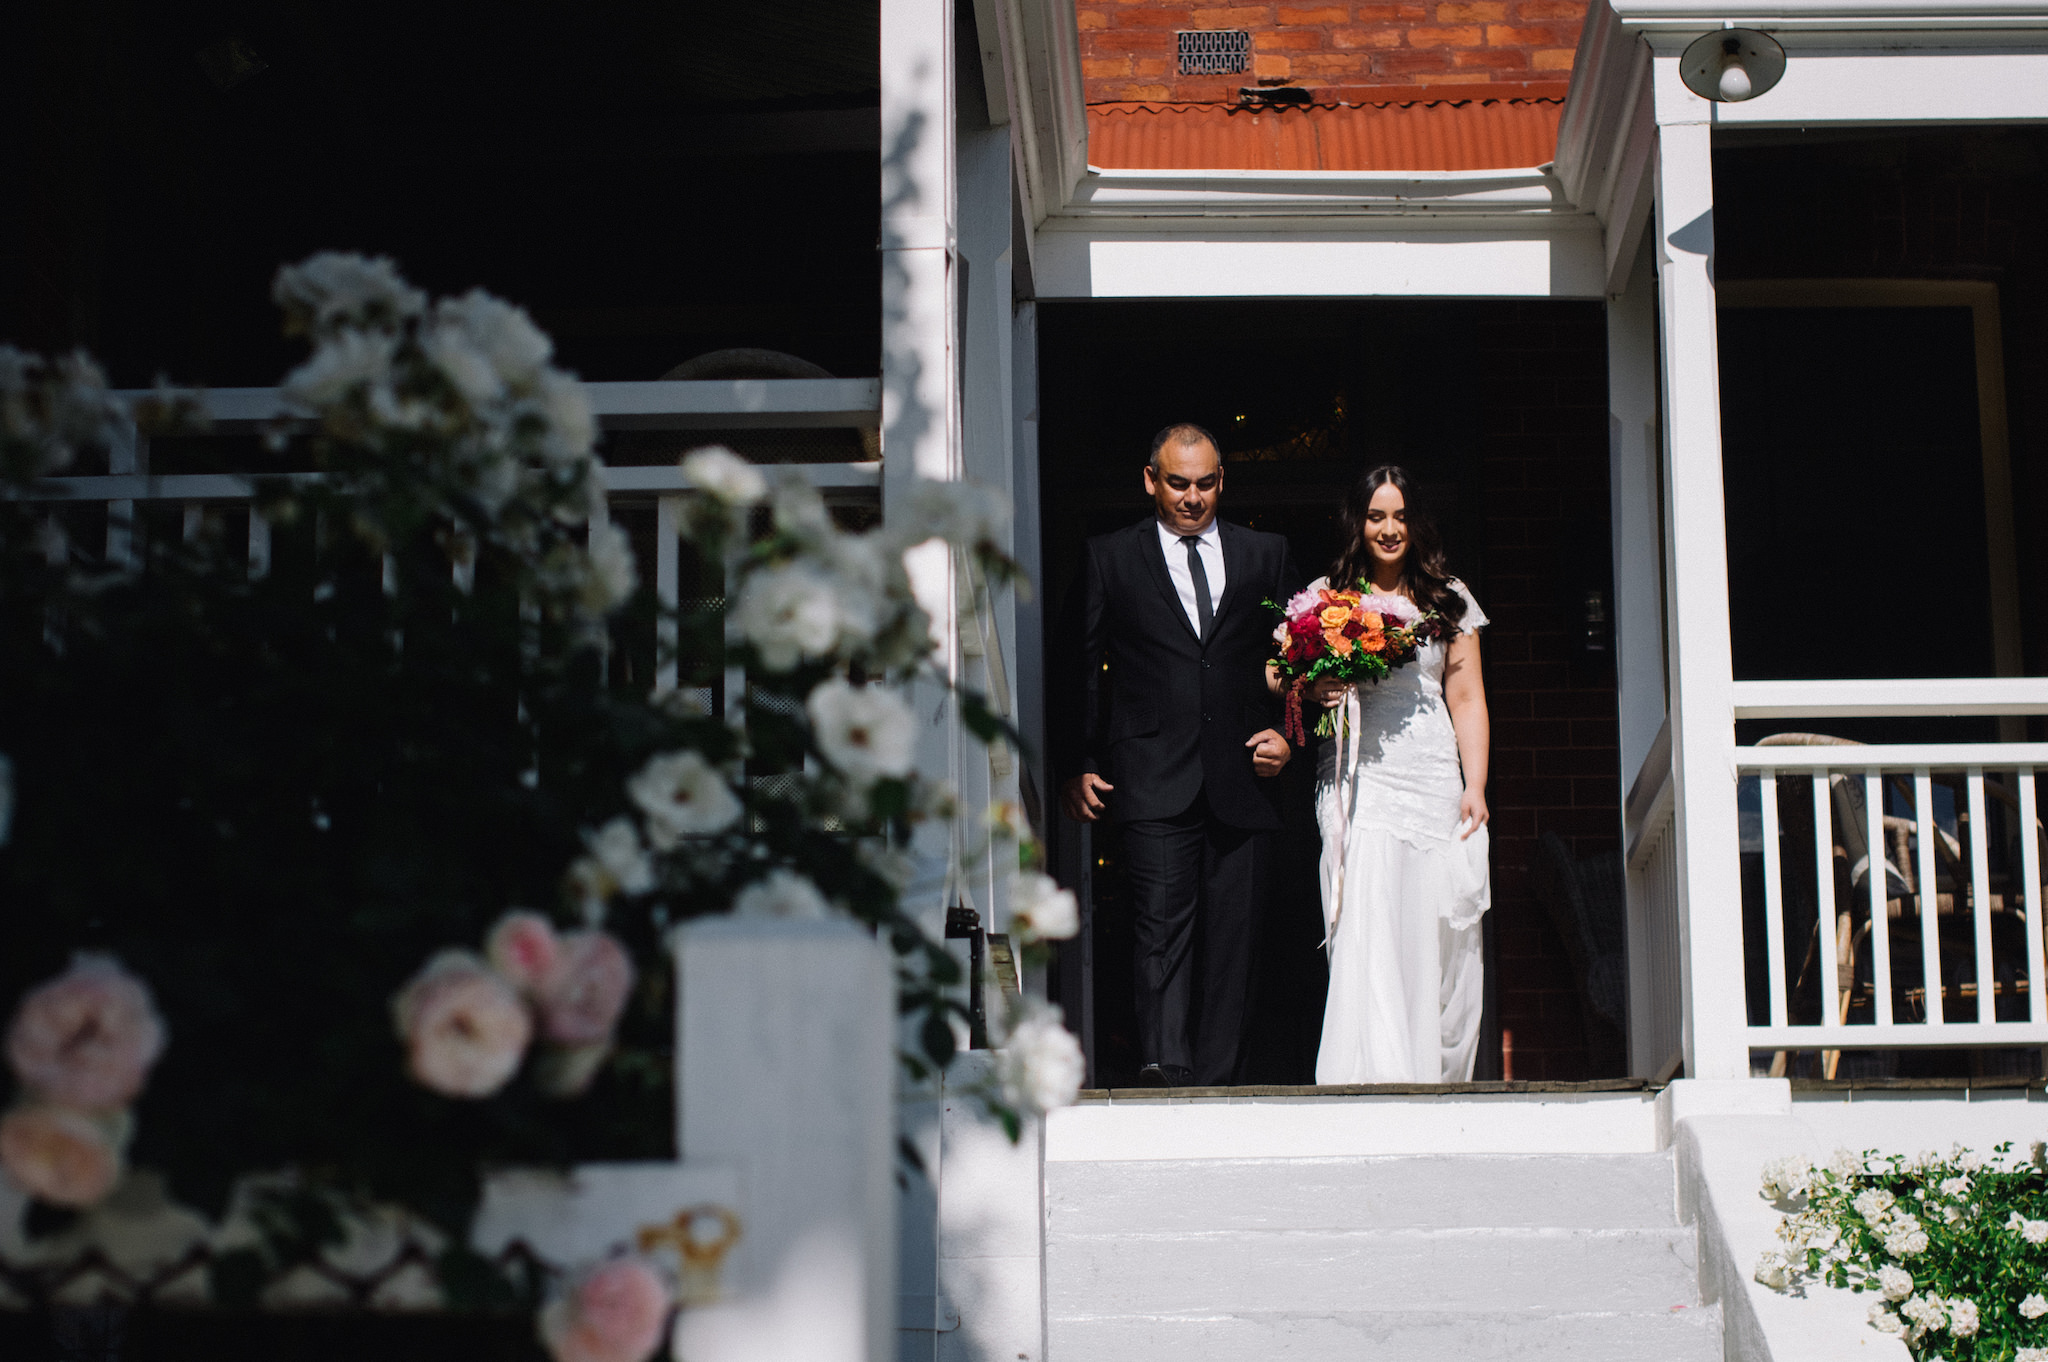 Laurelville Manor Ceremony Sarah Marvin York Wedding Photographer 2